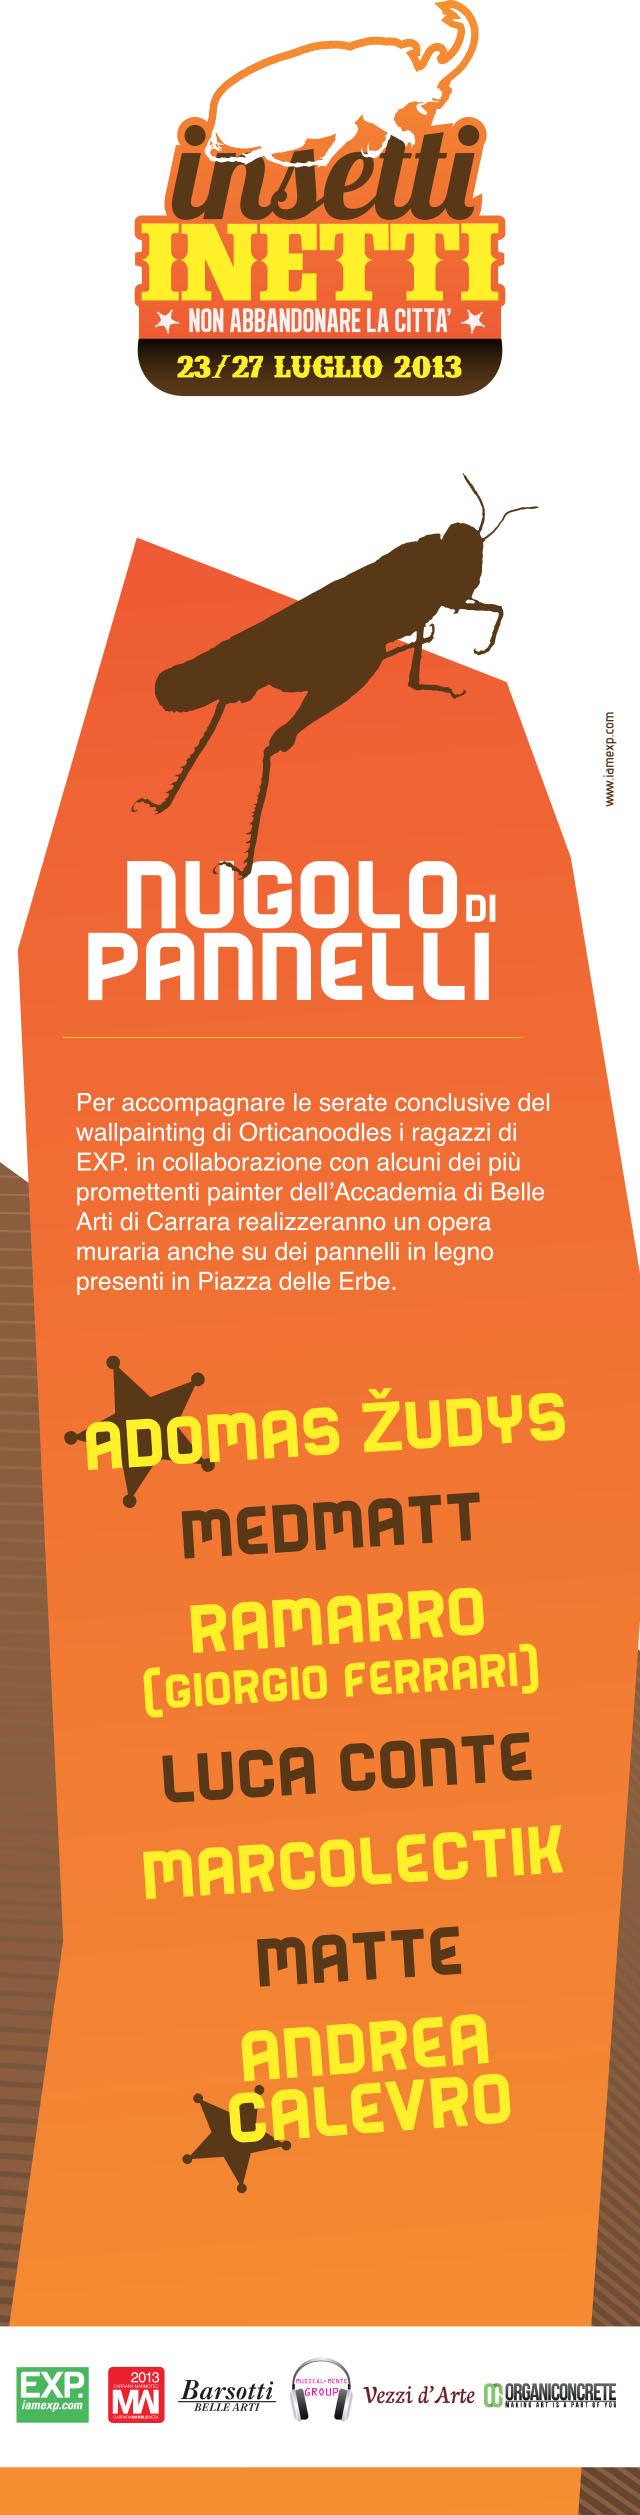 pannelli2013